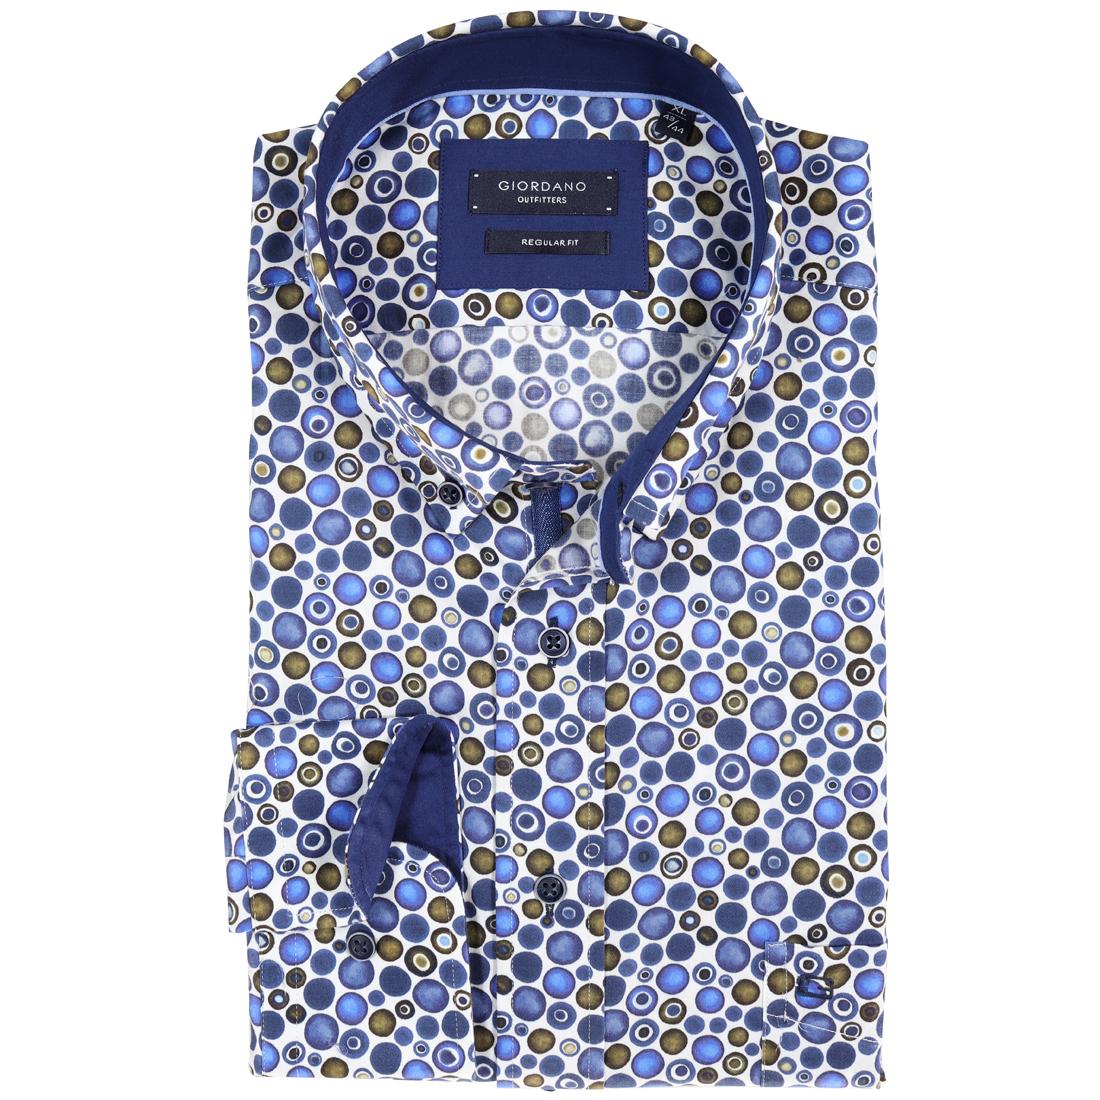 Giordano overhemd Regular Fit 827031 in het Blauw